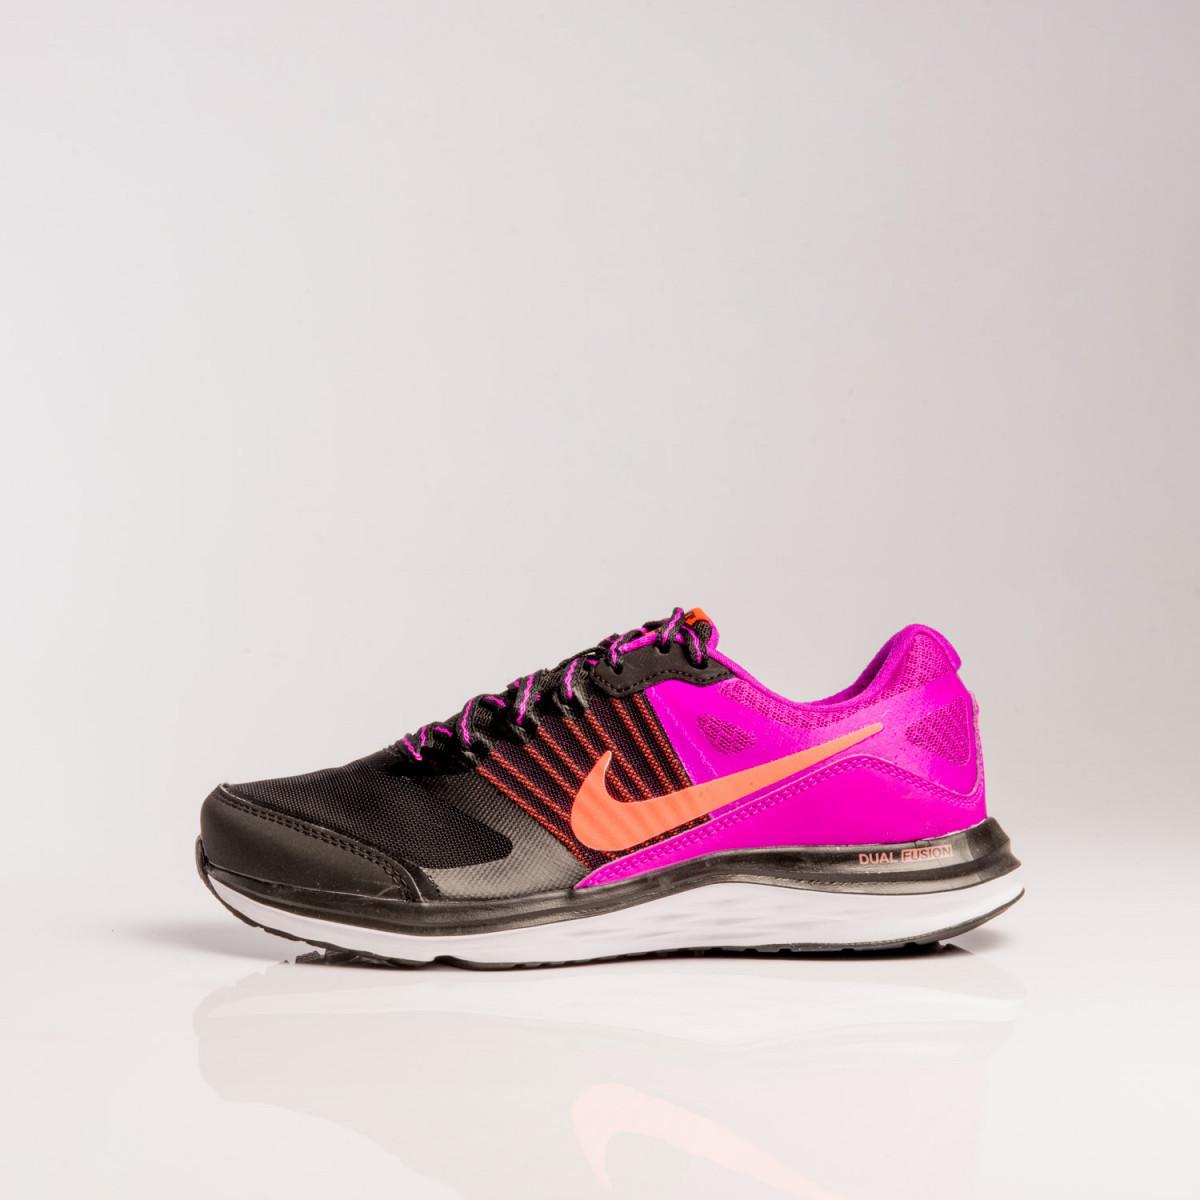 Zapatillas Nike Wmns Dual Fusion X Msl